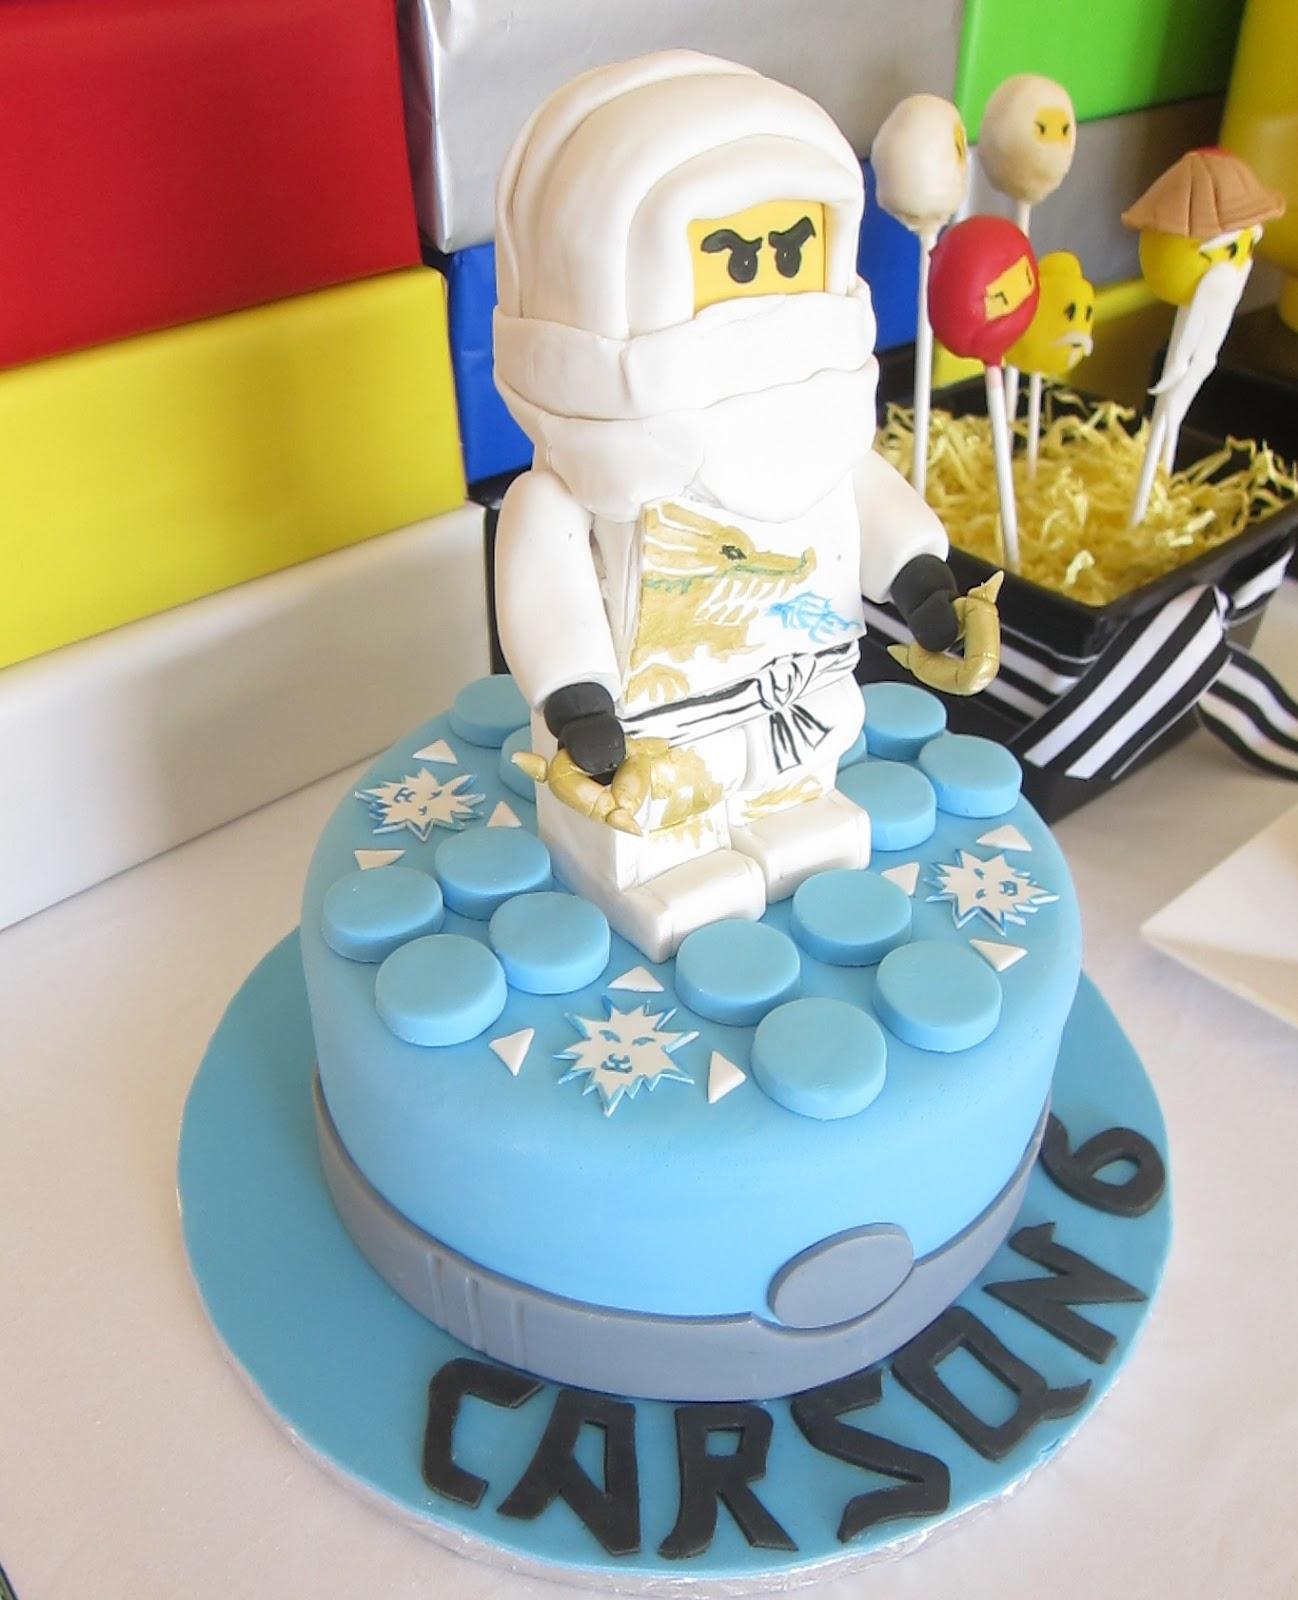 Lego Ninjago Birthday Cake Ideas